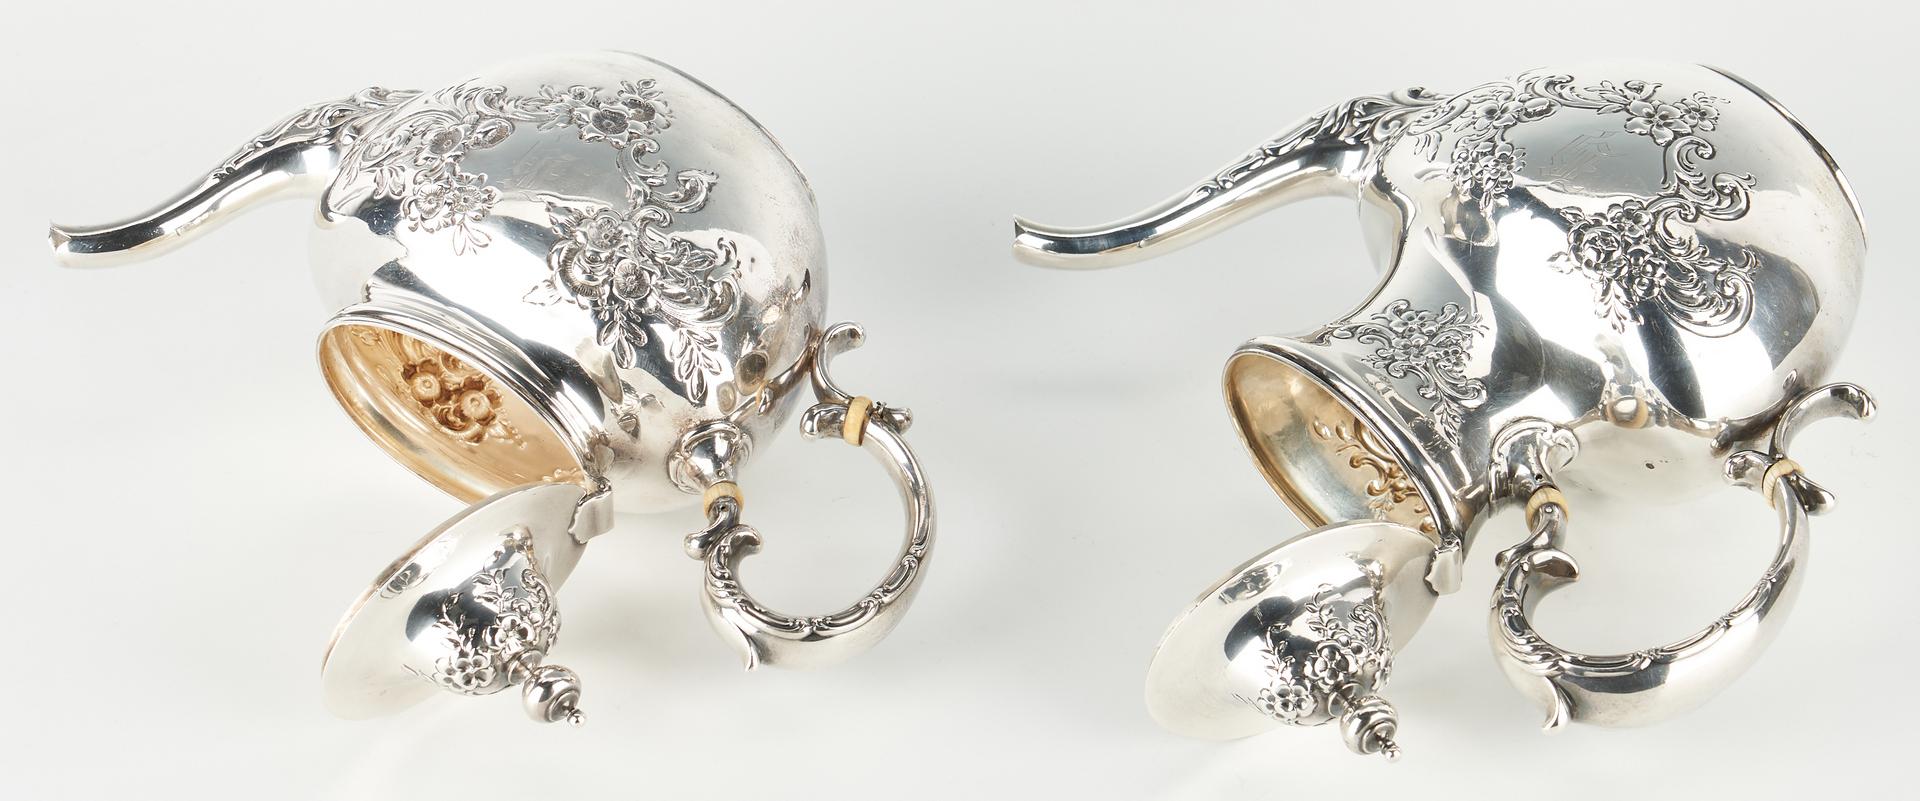 Lot 514: 4 Pcs. Whiting Sterling Silver Tea Set w/ Repousse Floral Design